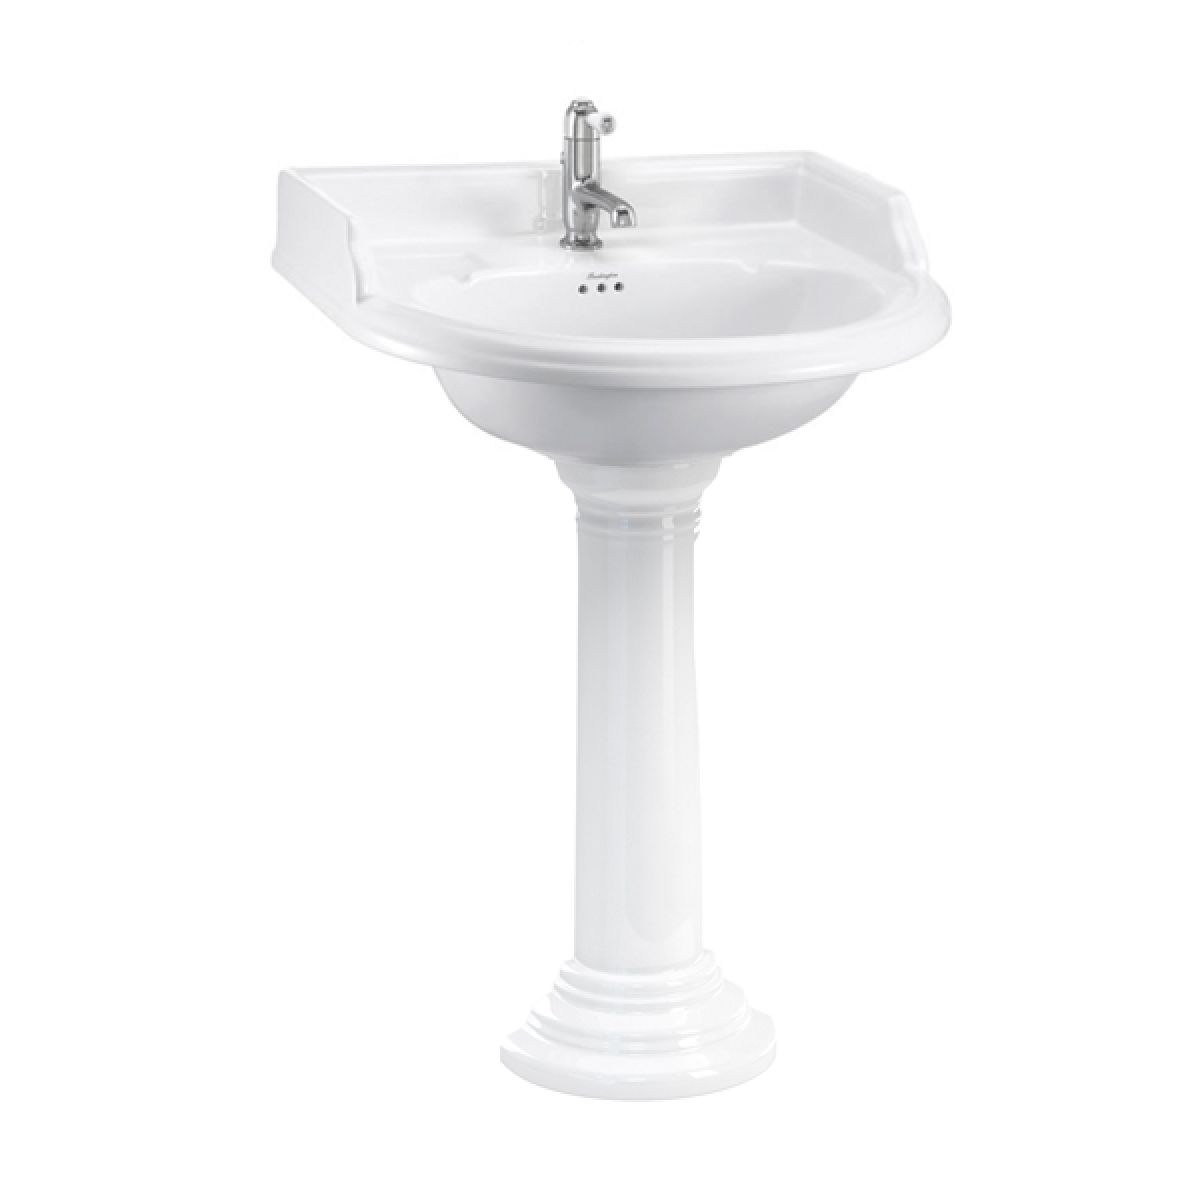 Burlington Classic Round Basin with Regal Pedestal 650mm